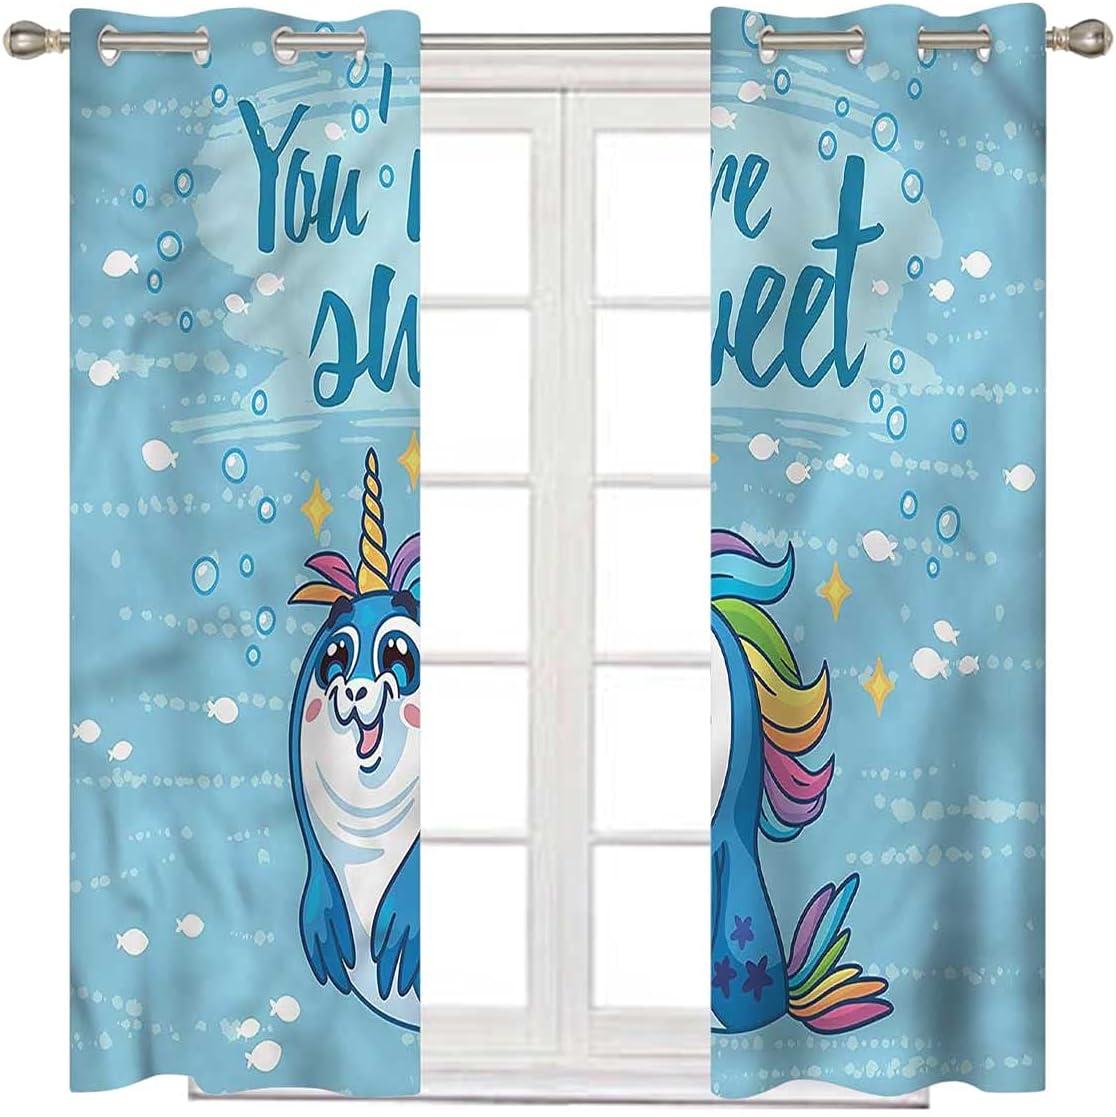 Unicorn Short discount Curtain 108 Inch Long Sea Black Max 64% OFF and Penguin Blacko